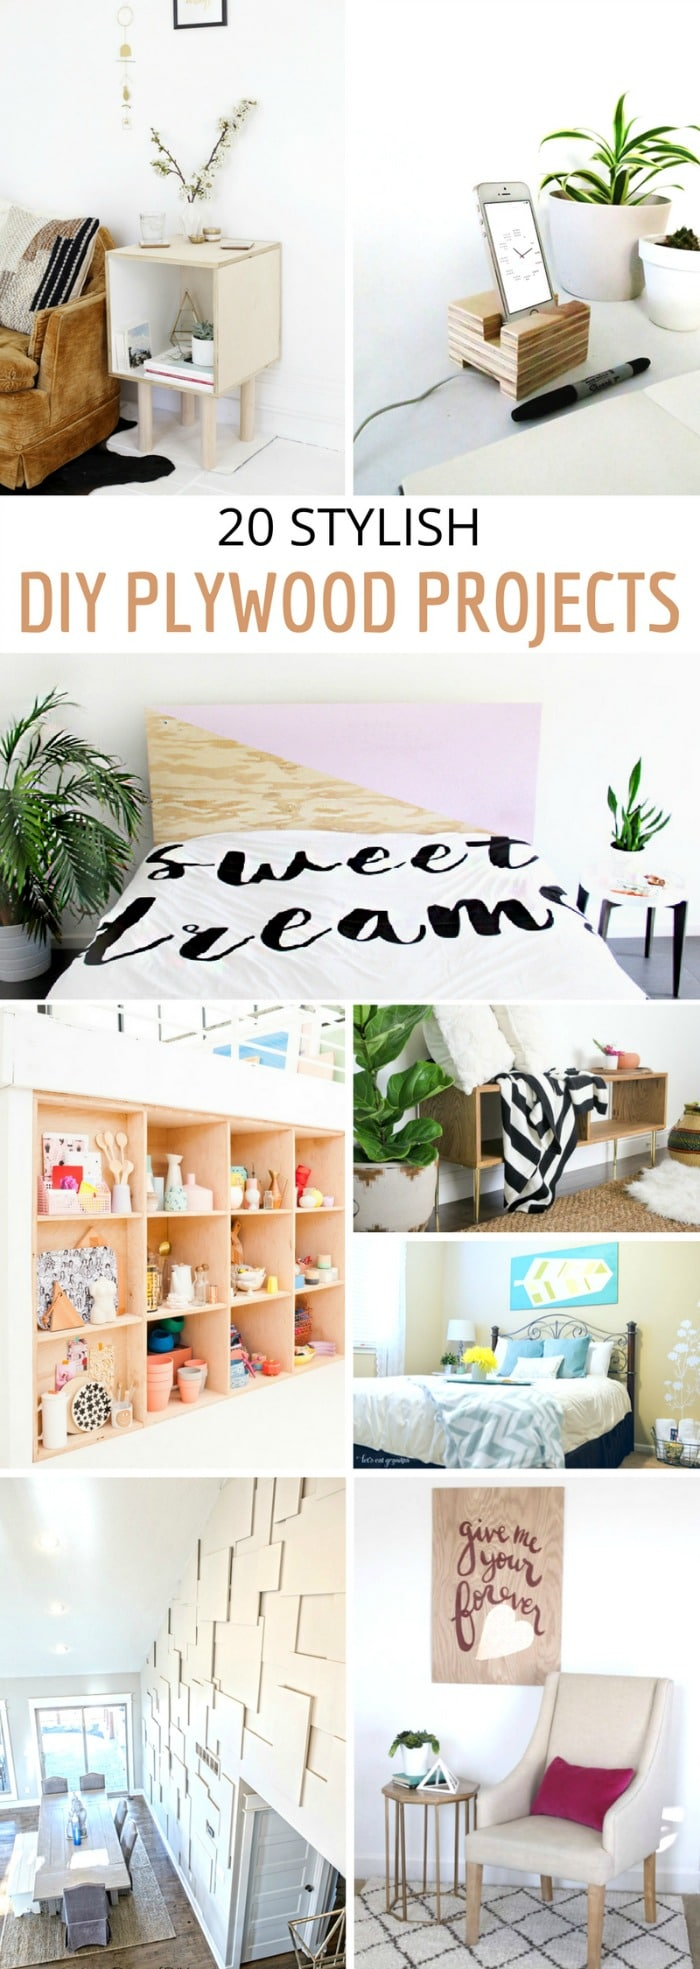 20 Stylish DIY Plywood Projects